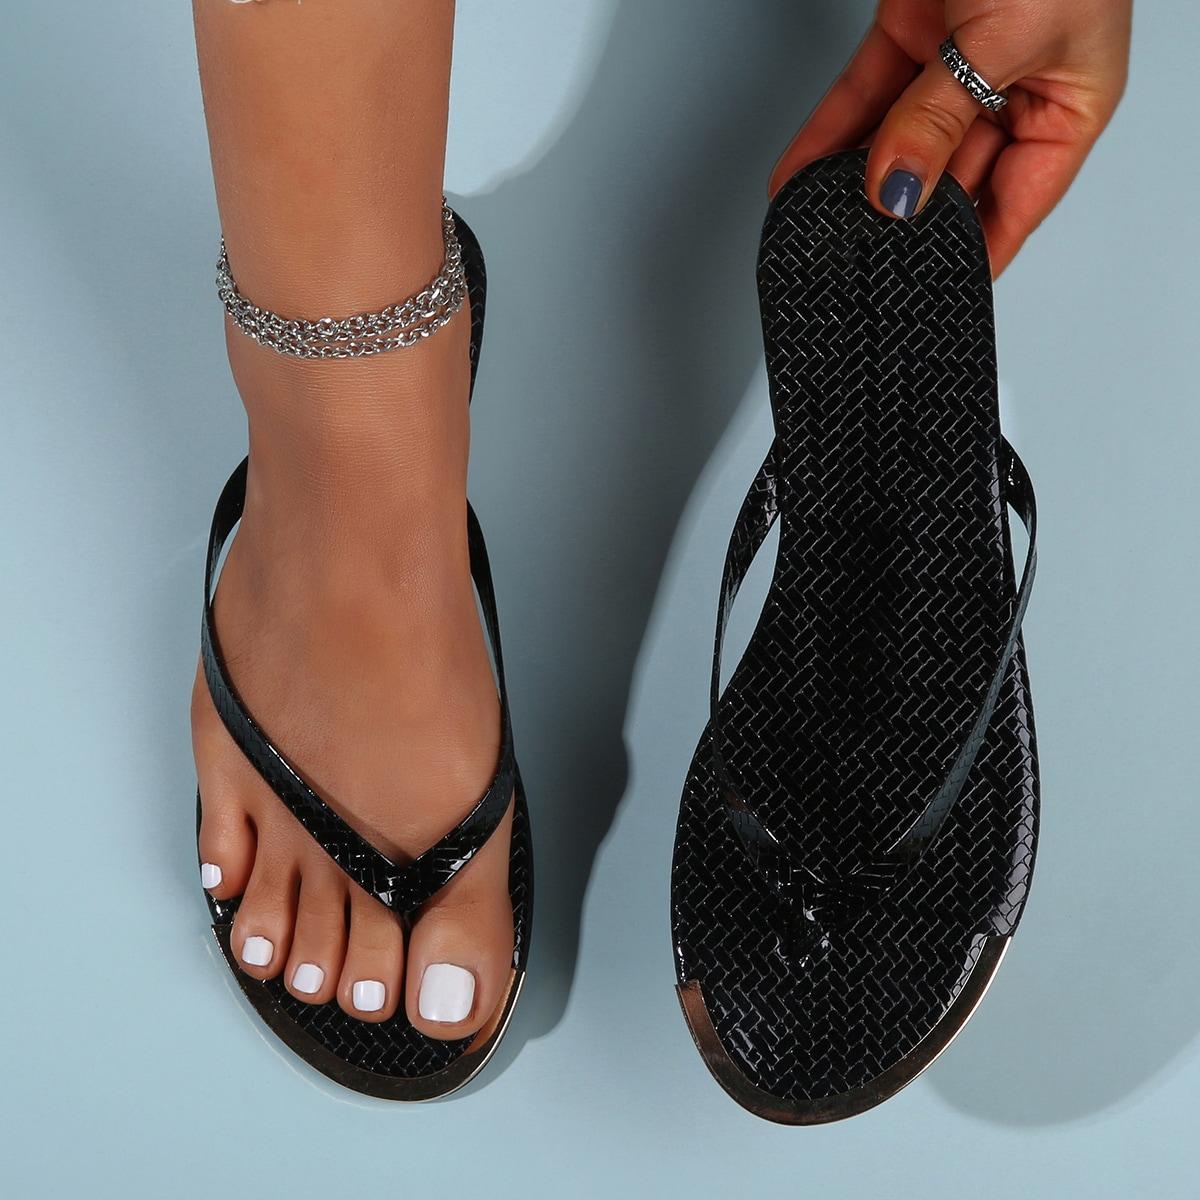 Вьетнамки с металлическим краем SheIn swshoes03201218045